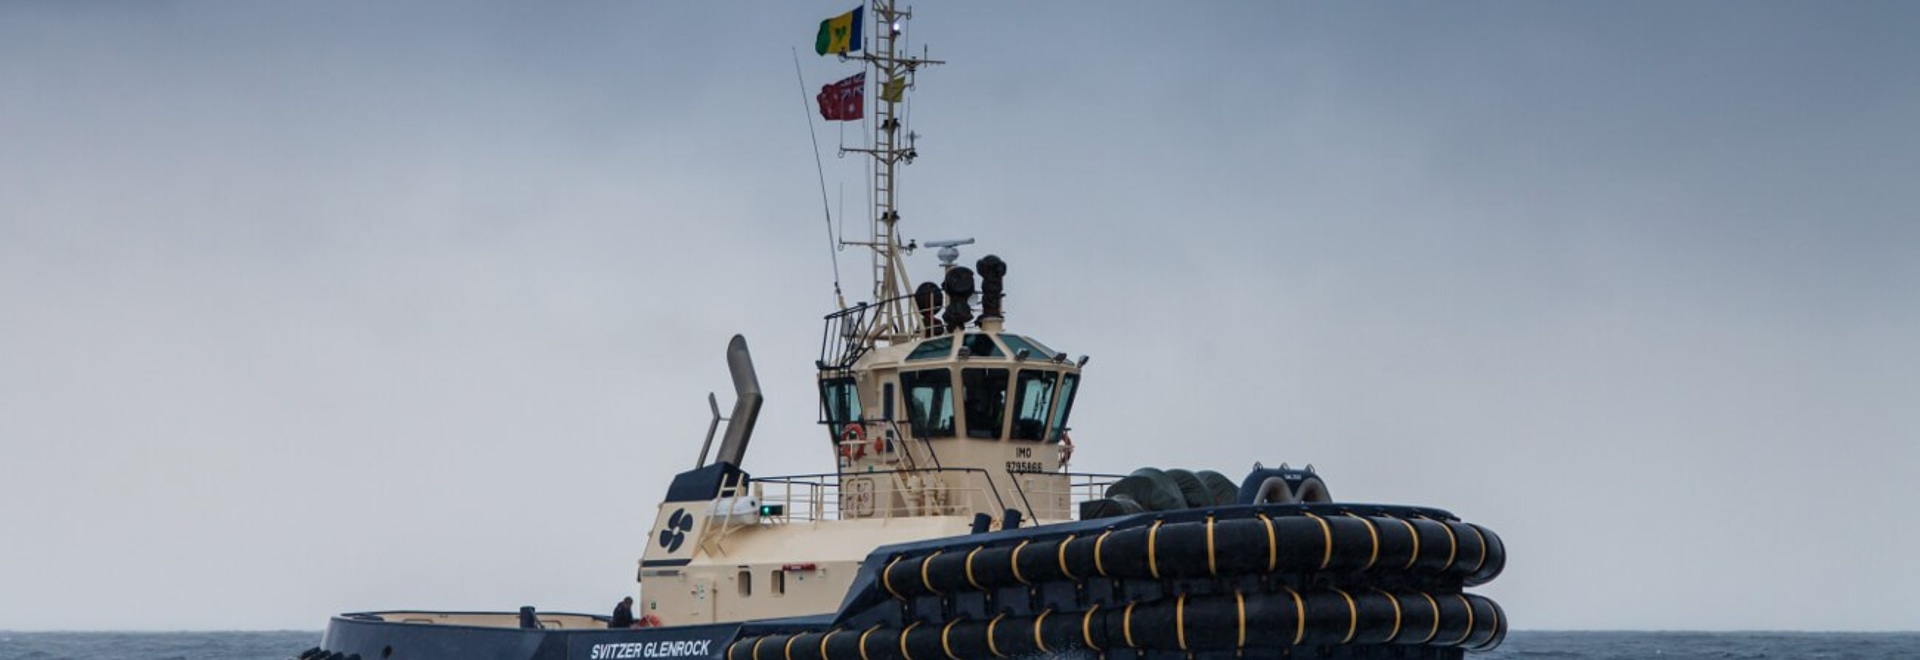 DAMEN ASD TUG 3212 SVITZER GLENROCK DELIVERED TO SVITZER AUSTRALIA